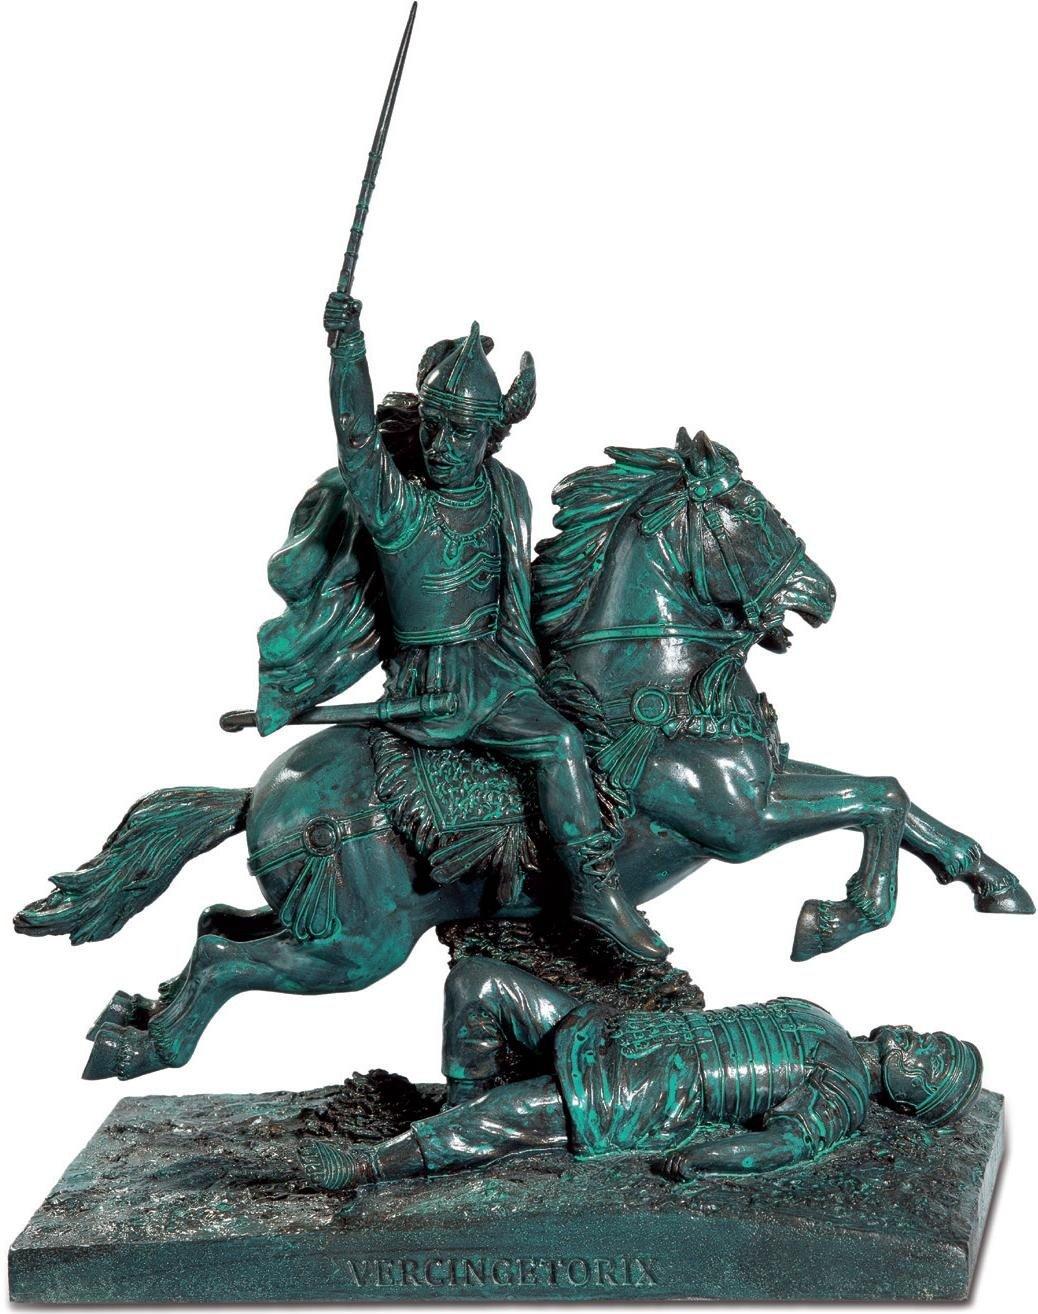 RE0165 Statue Vercingetorix A Cheval par Frederic Auguste Bartholdi Katerina Prestige